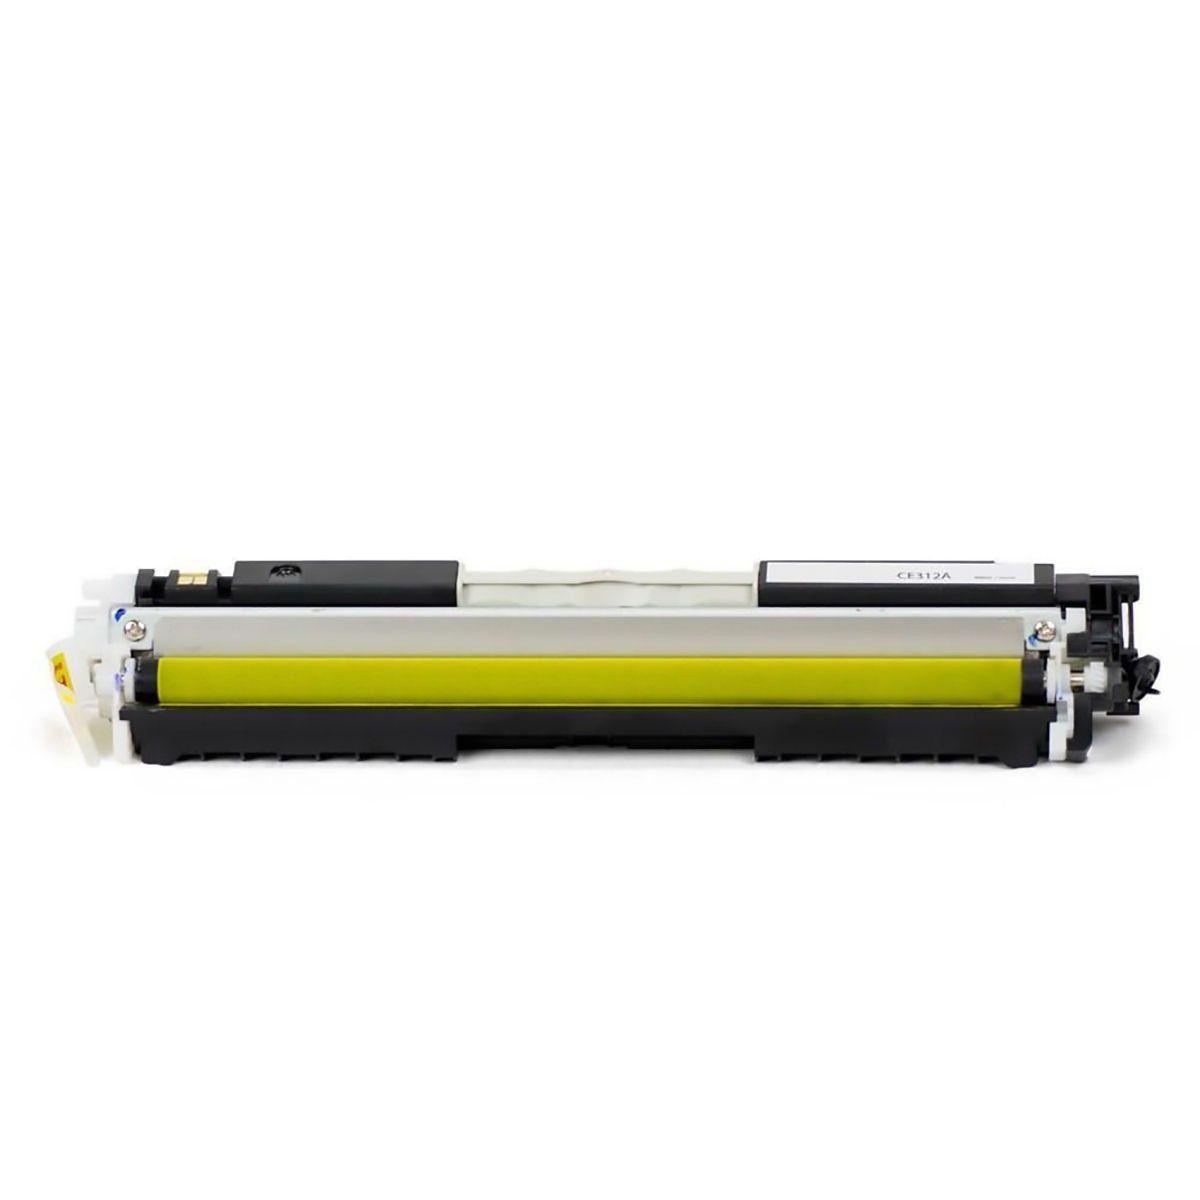 Compatível: Toner CE312A CF352A para HP CP1020 CP1025 M175 M176n M177 M177fw M275 M275nw 177fw / Amarelo / 1.000